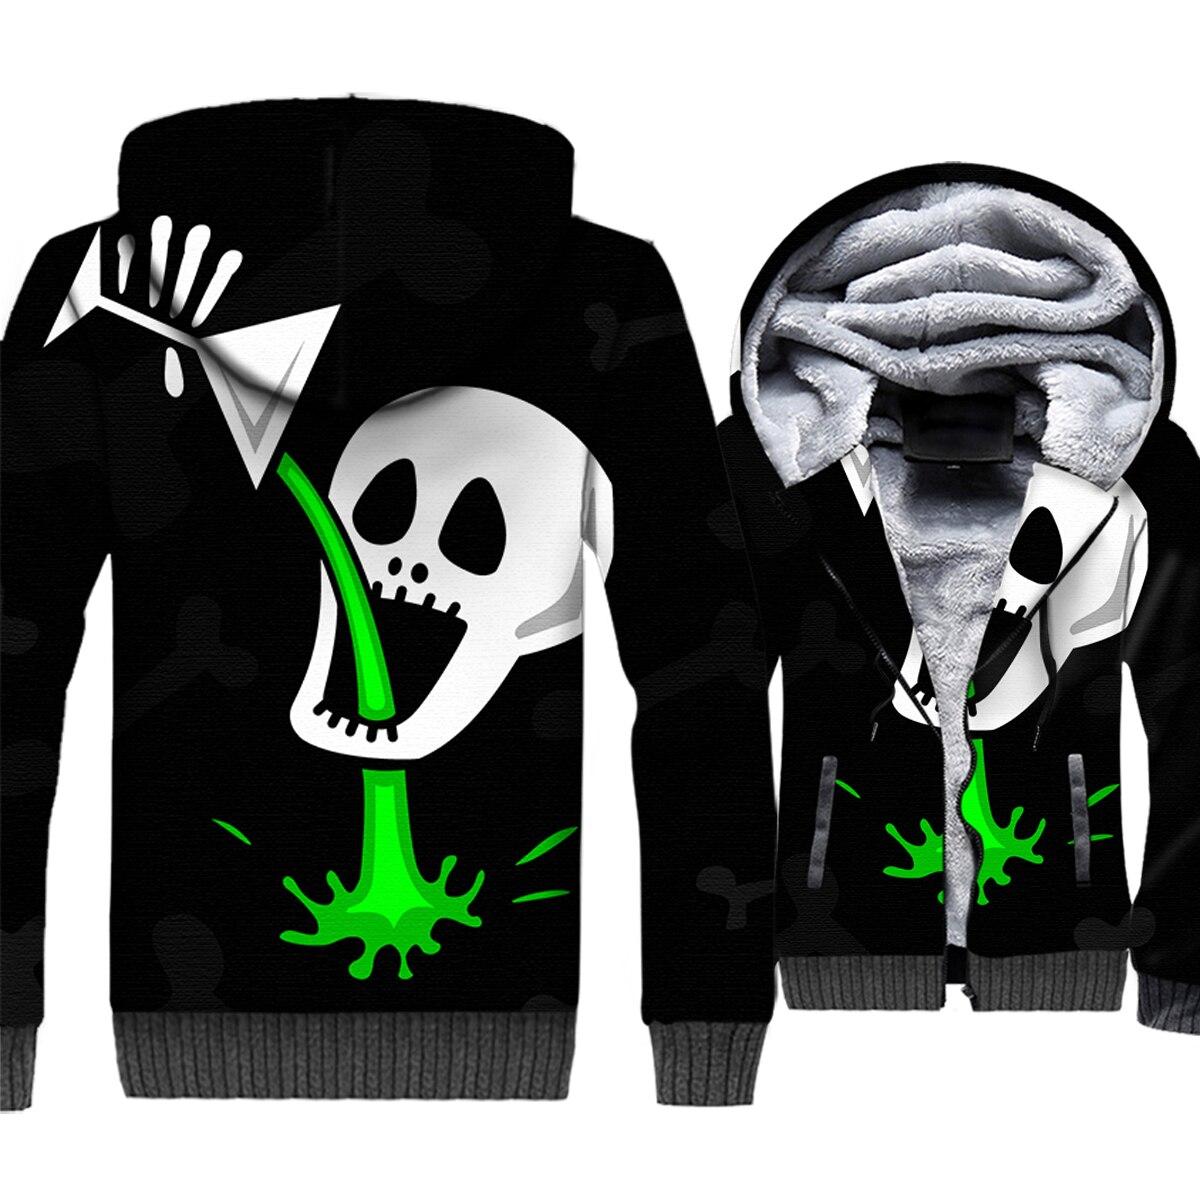 Funny Skull Hoodie Unique Creative Skull Drink Jackets 3D Men Harajuku Sweatshirt 2018 Winter Fleece Coat Hip Hop Streetwear 5XL